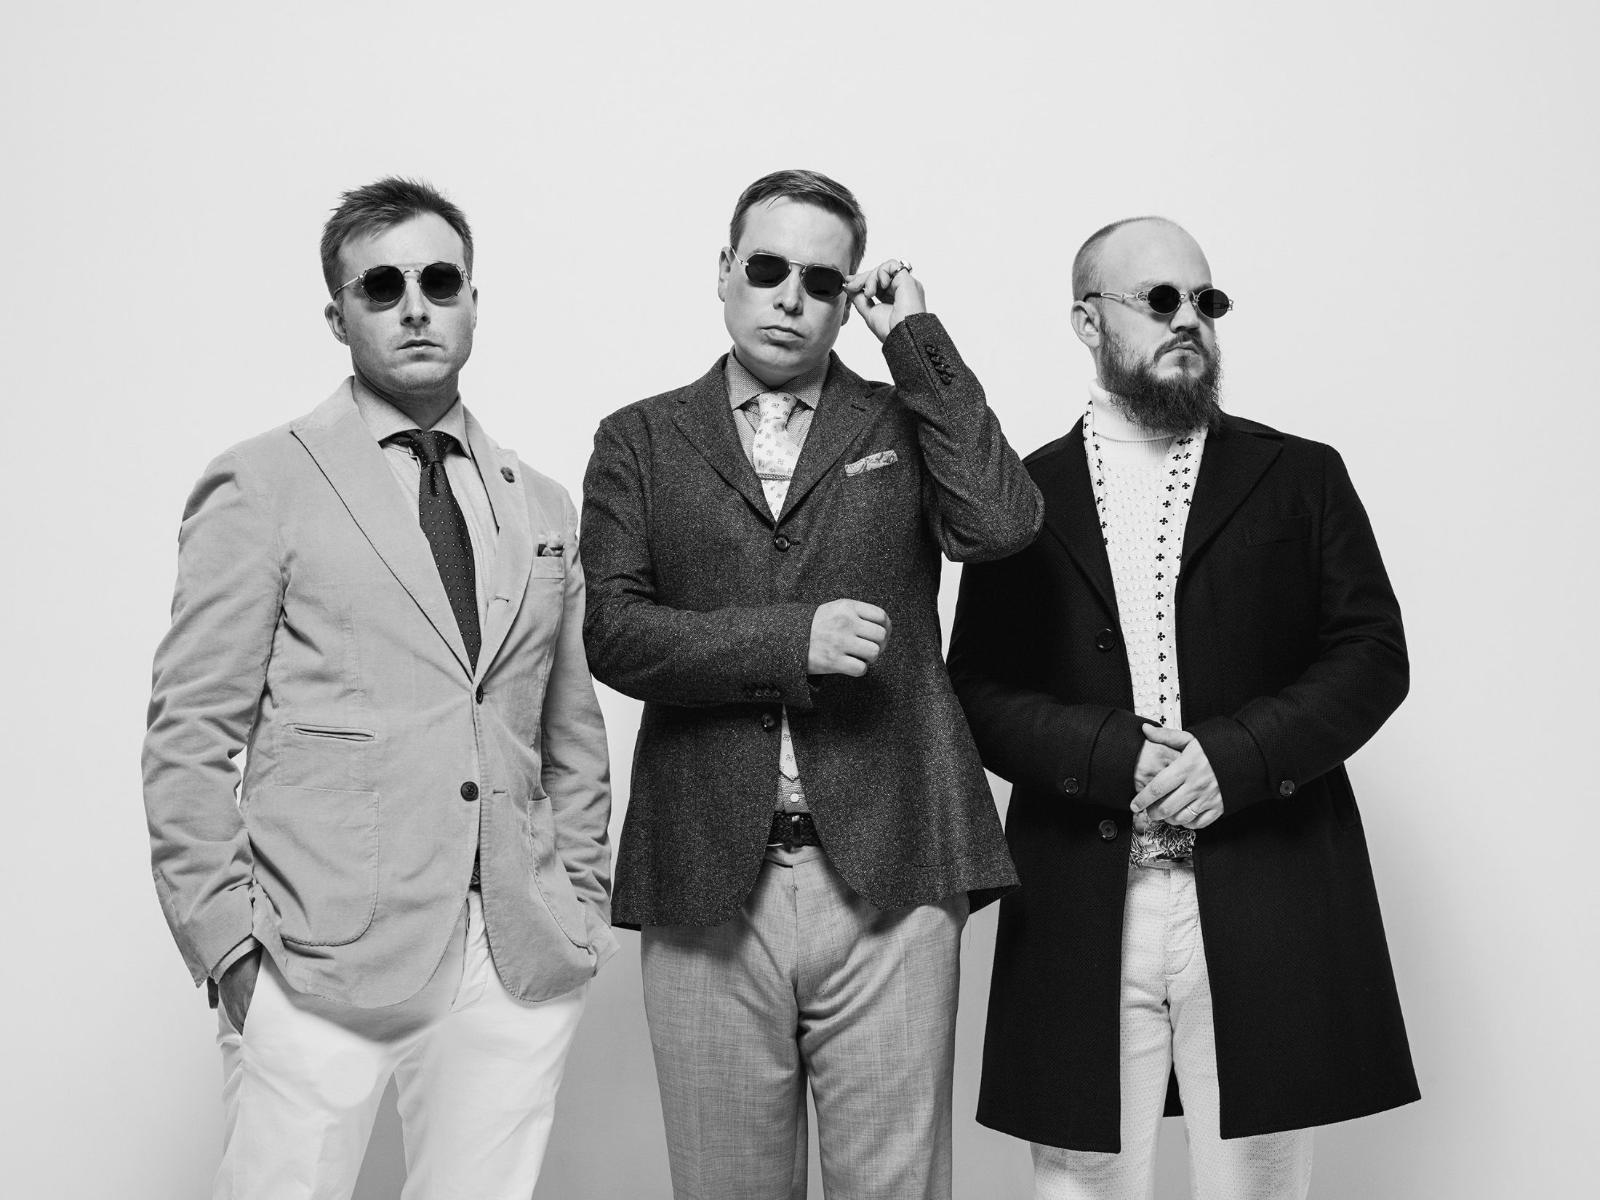 Teflon Brothers - varaa artisti alkuvuoden juhliin / Venuu.fi